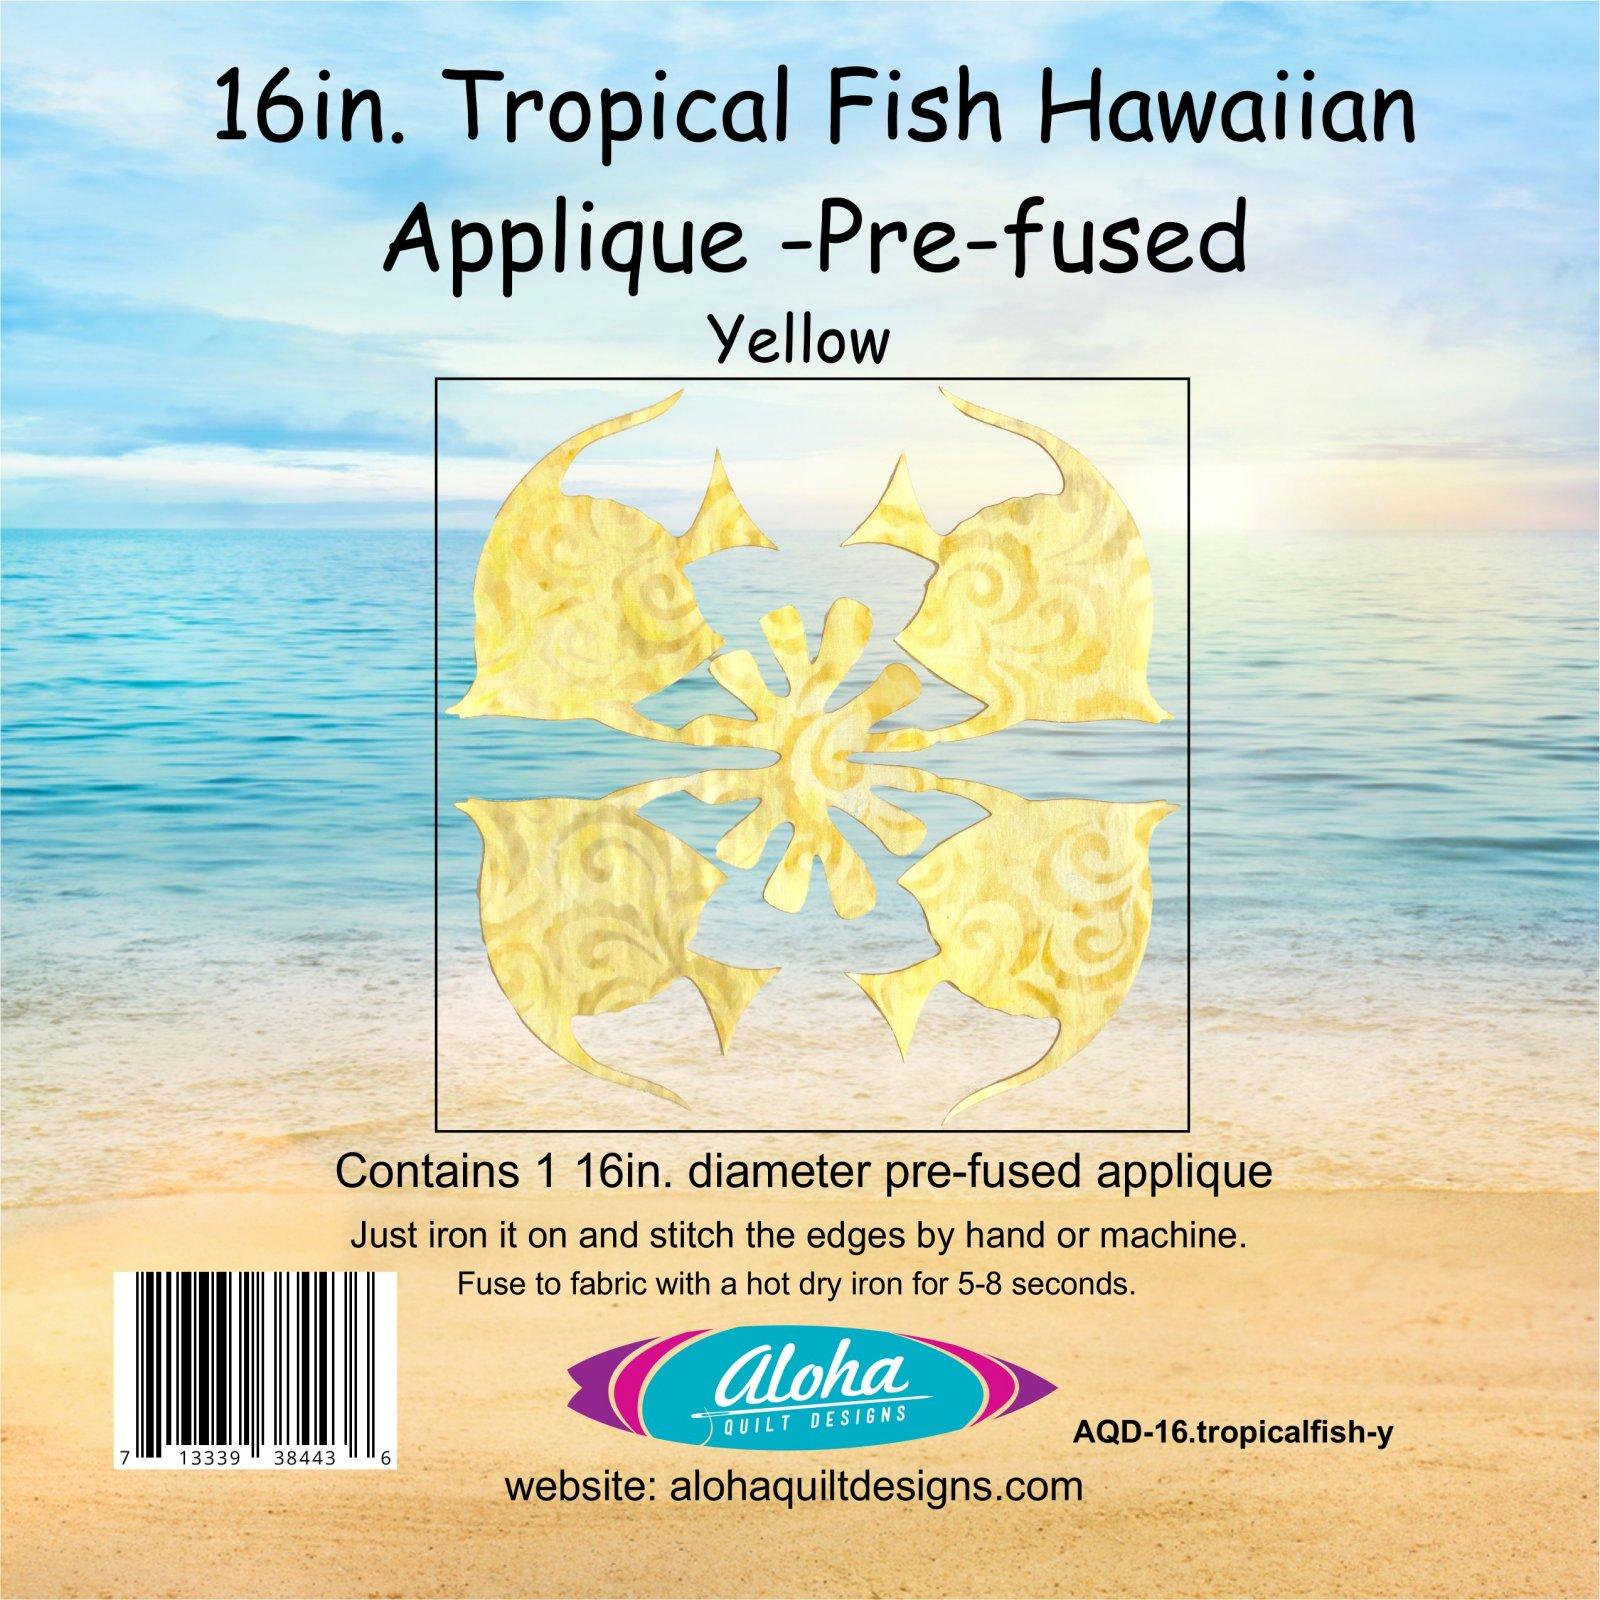 16in. Tropical Fish Hawaiian Fusible Applique